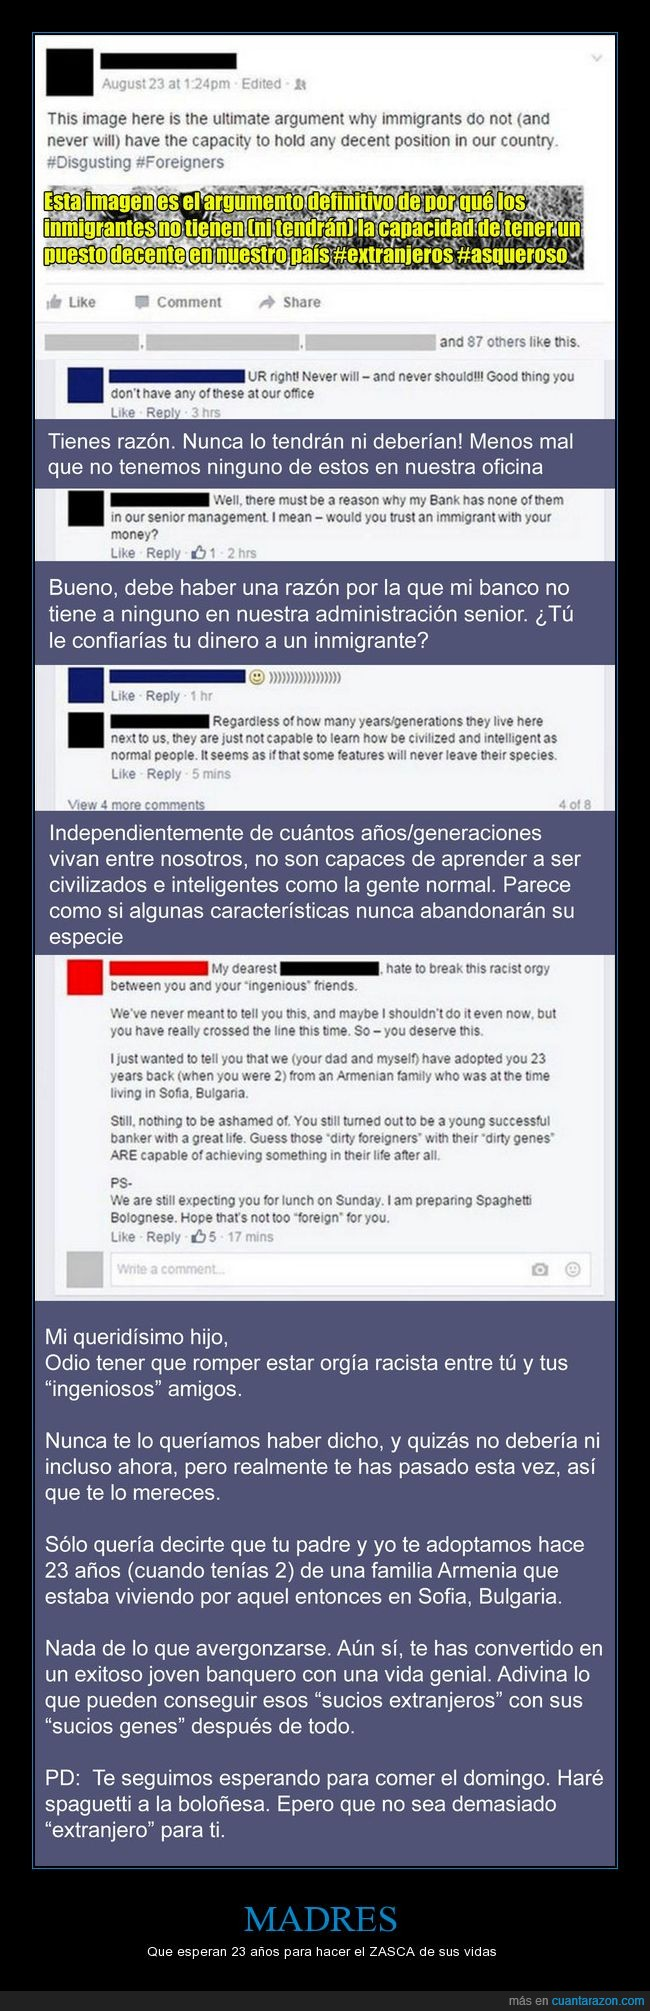 armenio,facebook,hijo,madre,racista,zasca